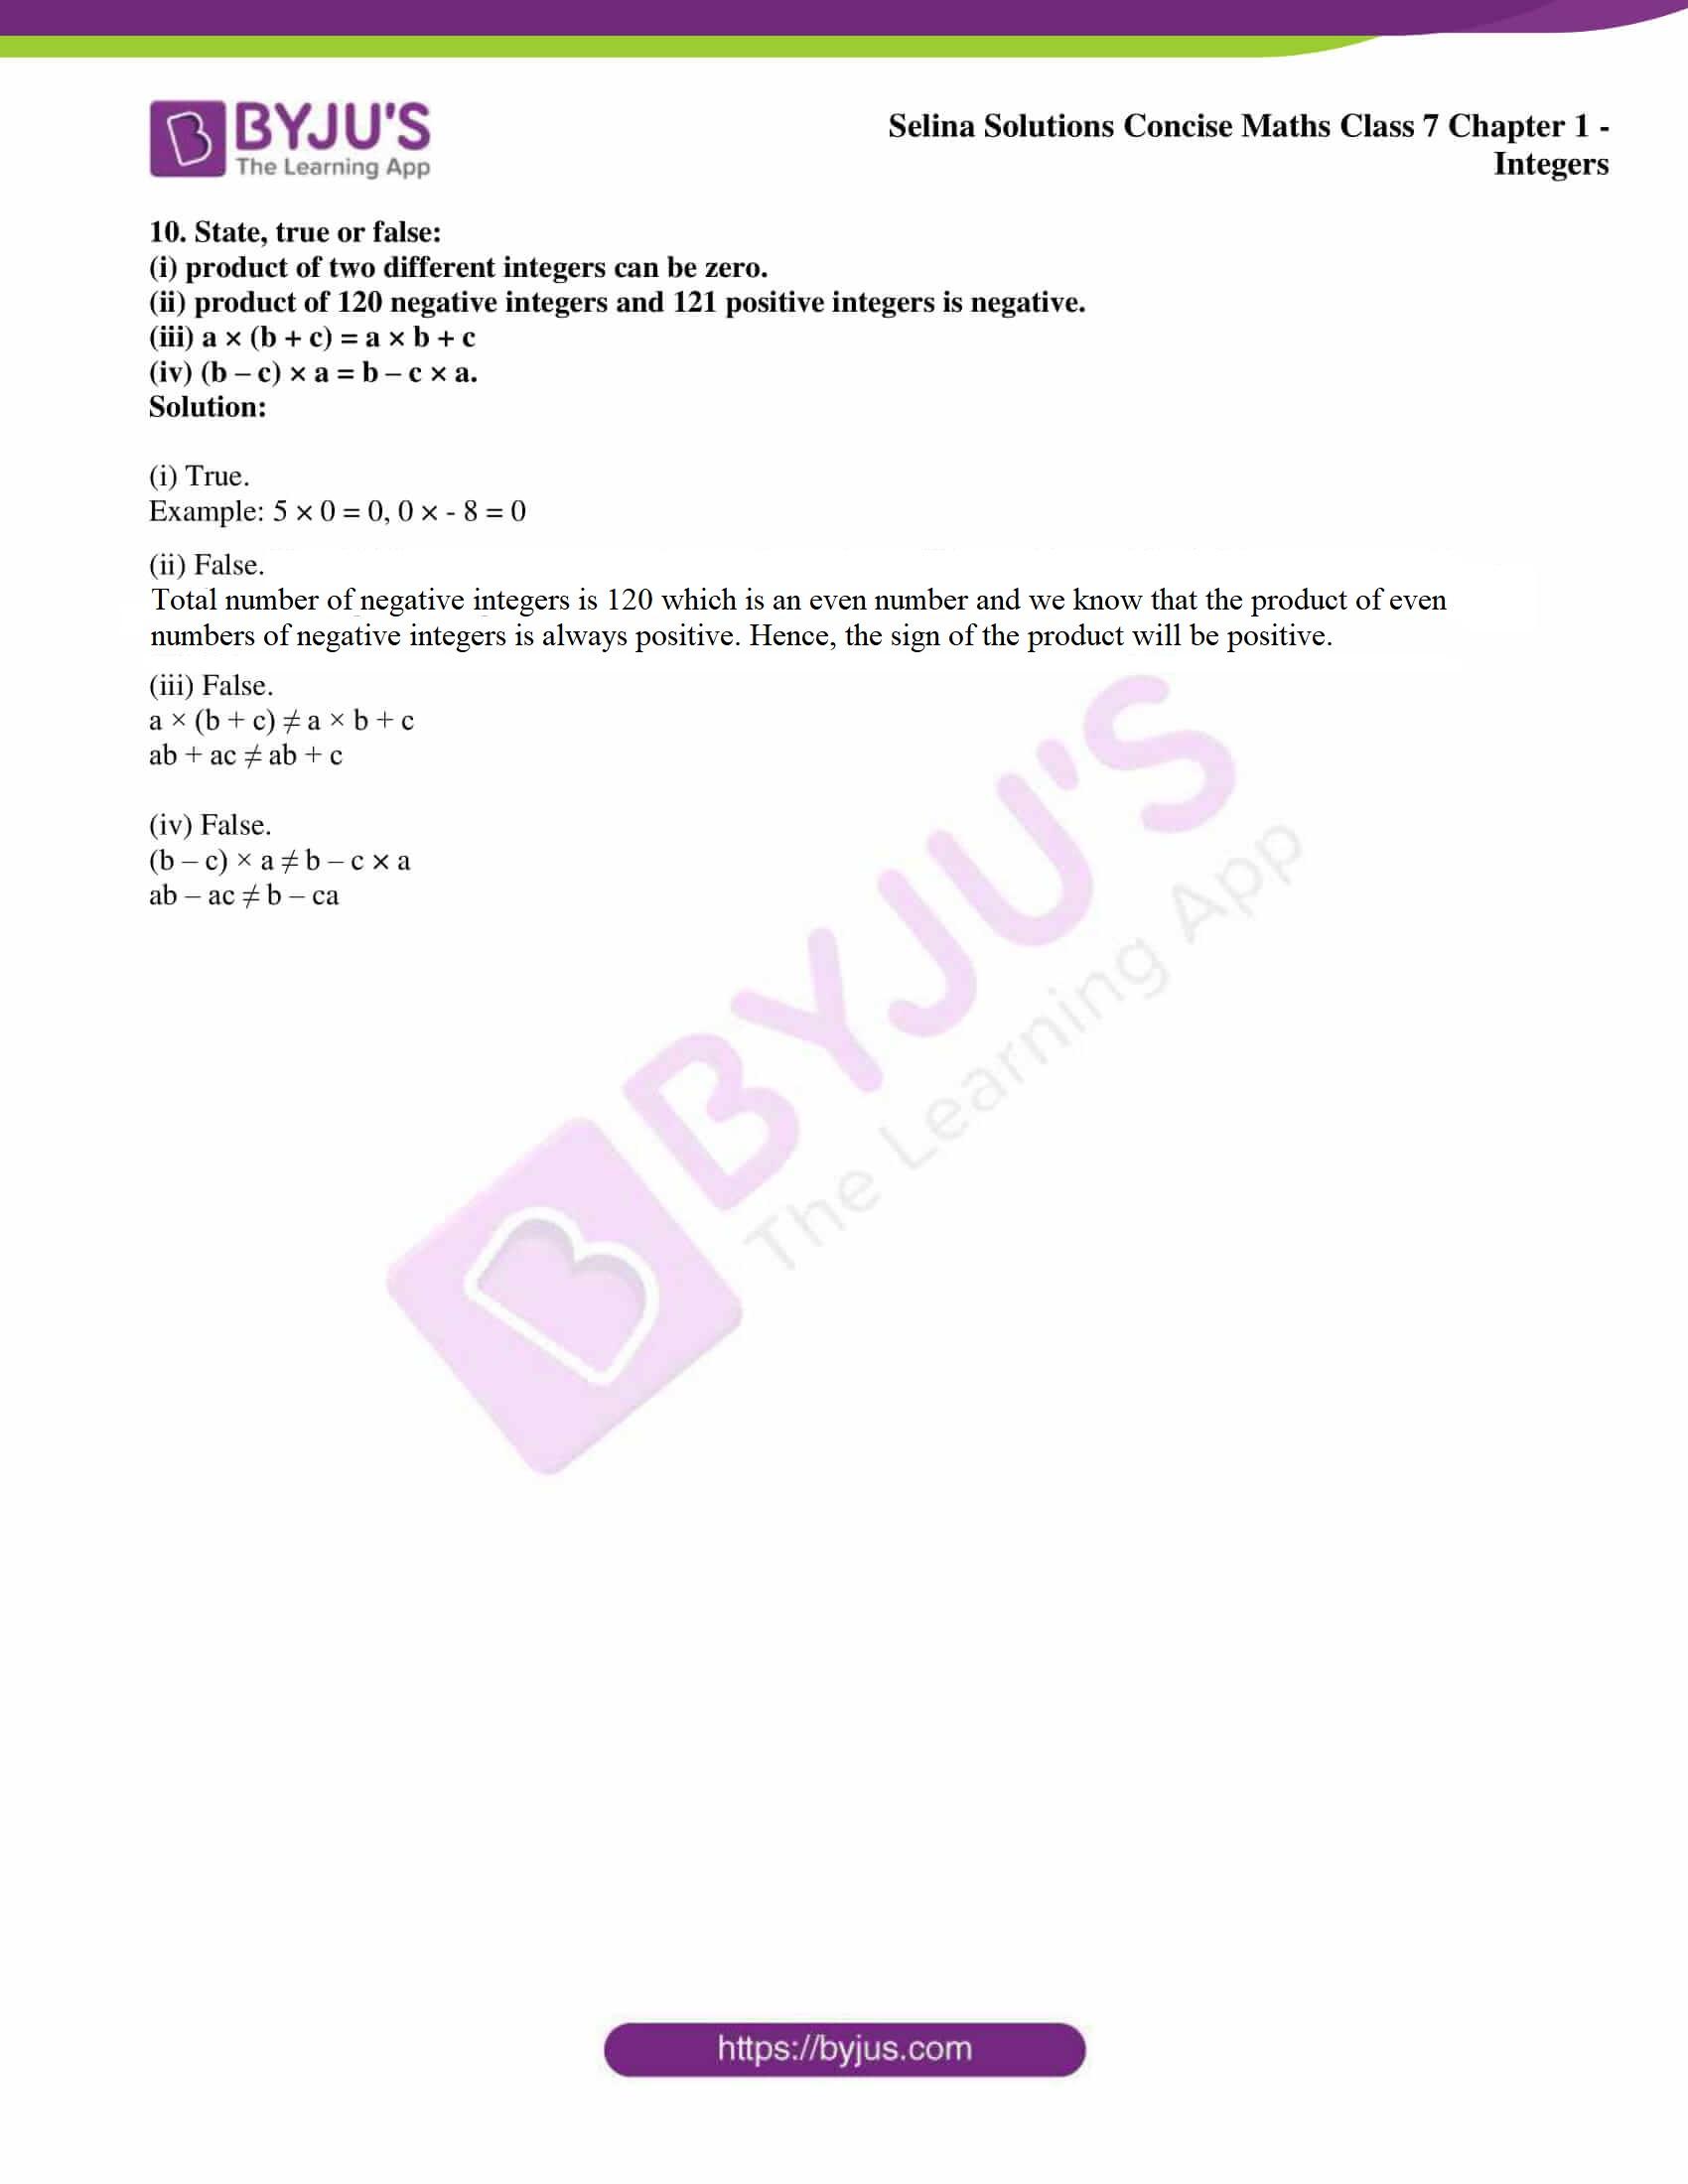 selina sol concise maths class 7 ch1 ex 1a 6